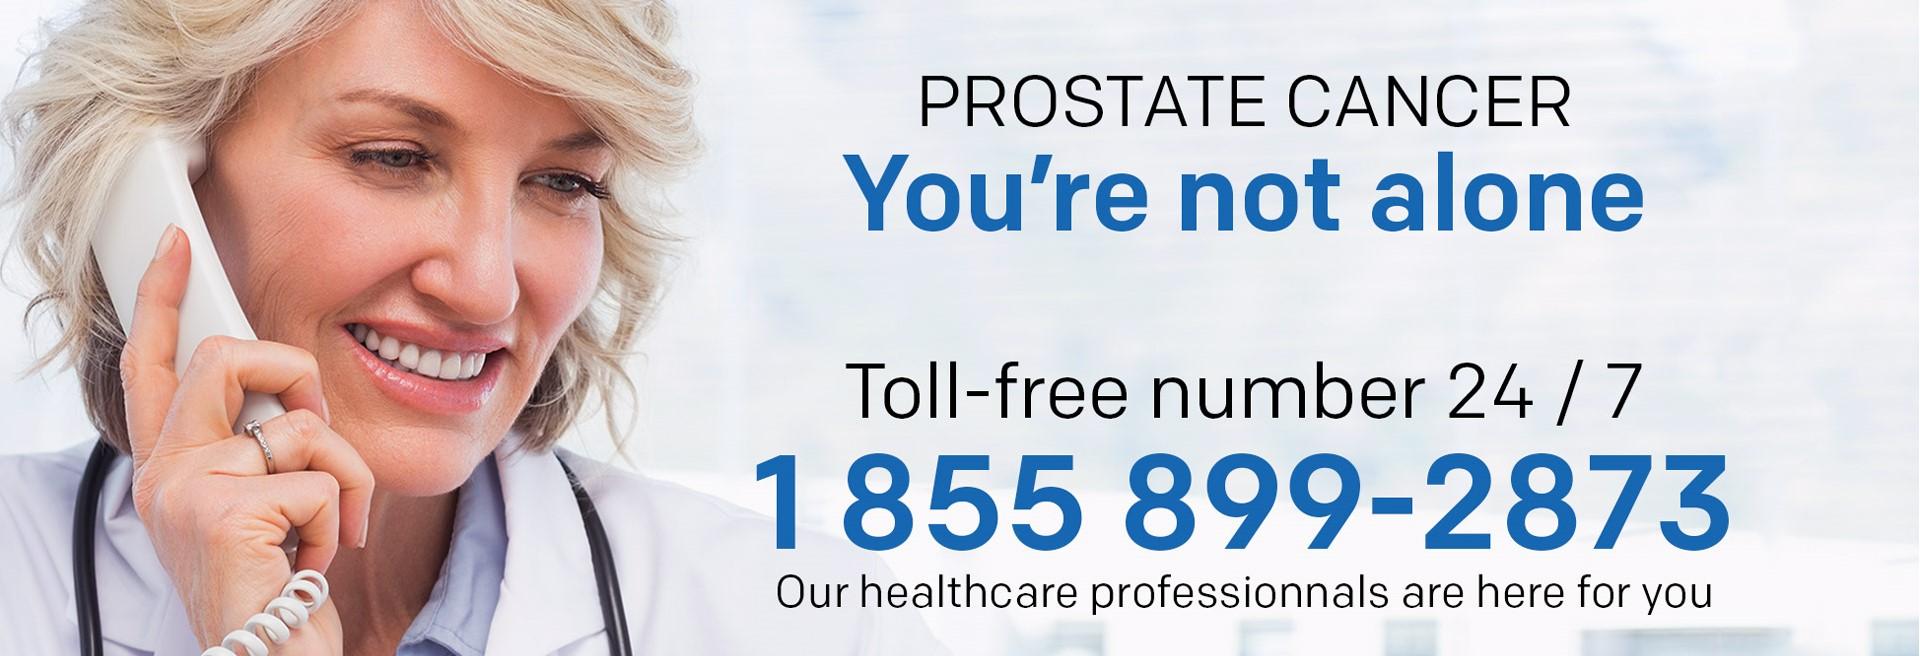 bandeau ligne 1855 pour cancer prostate